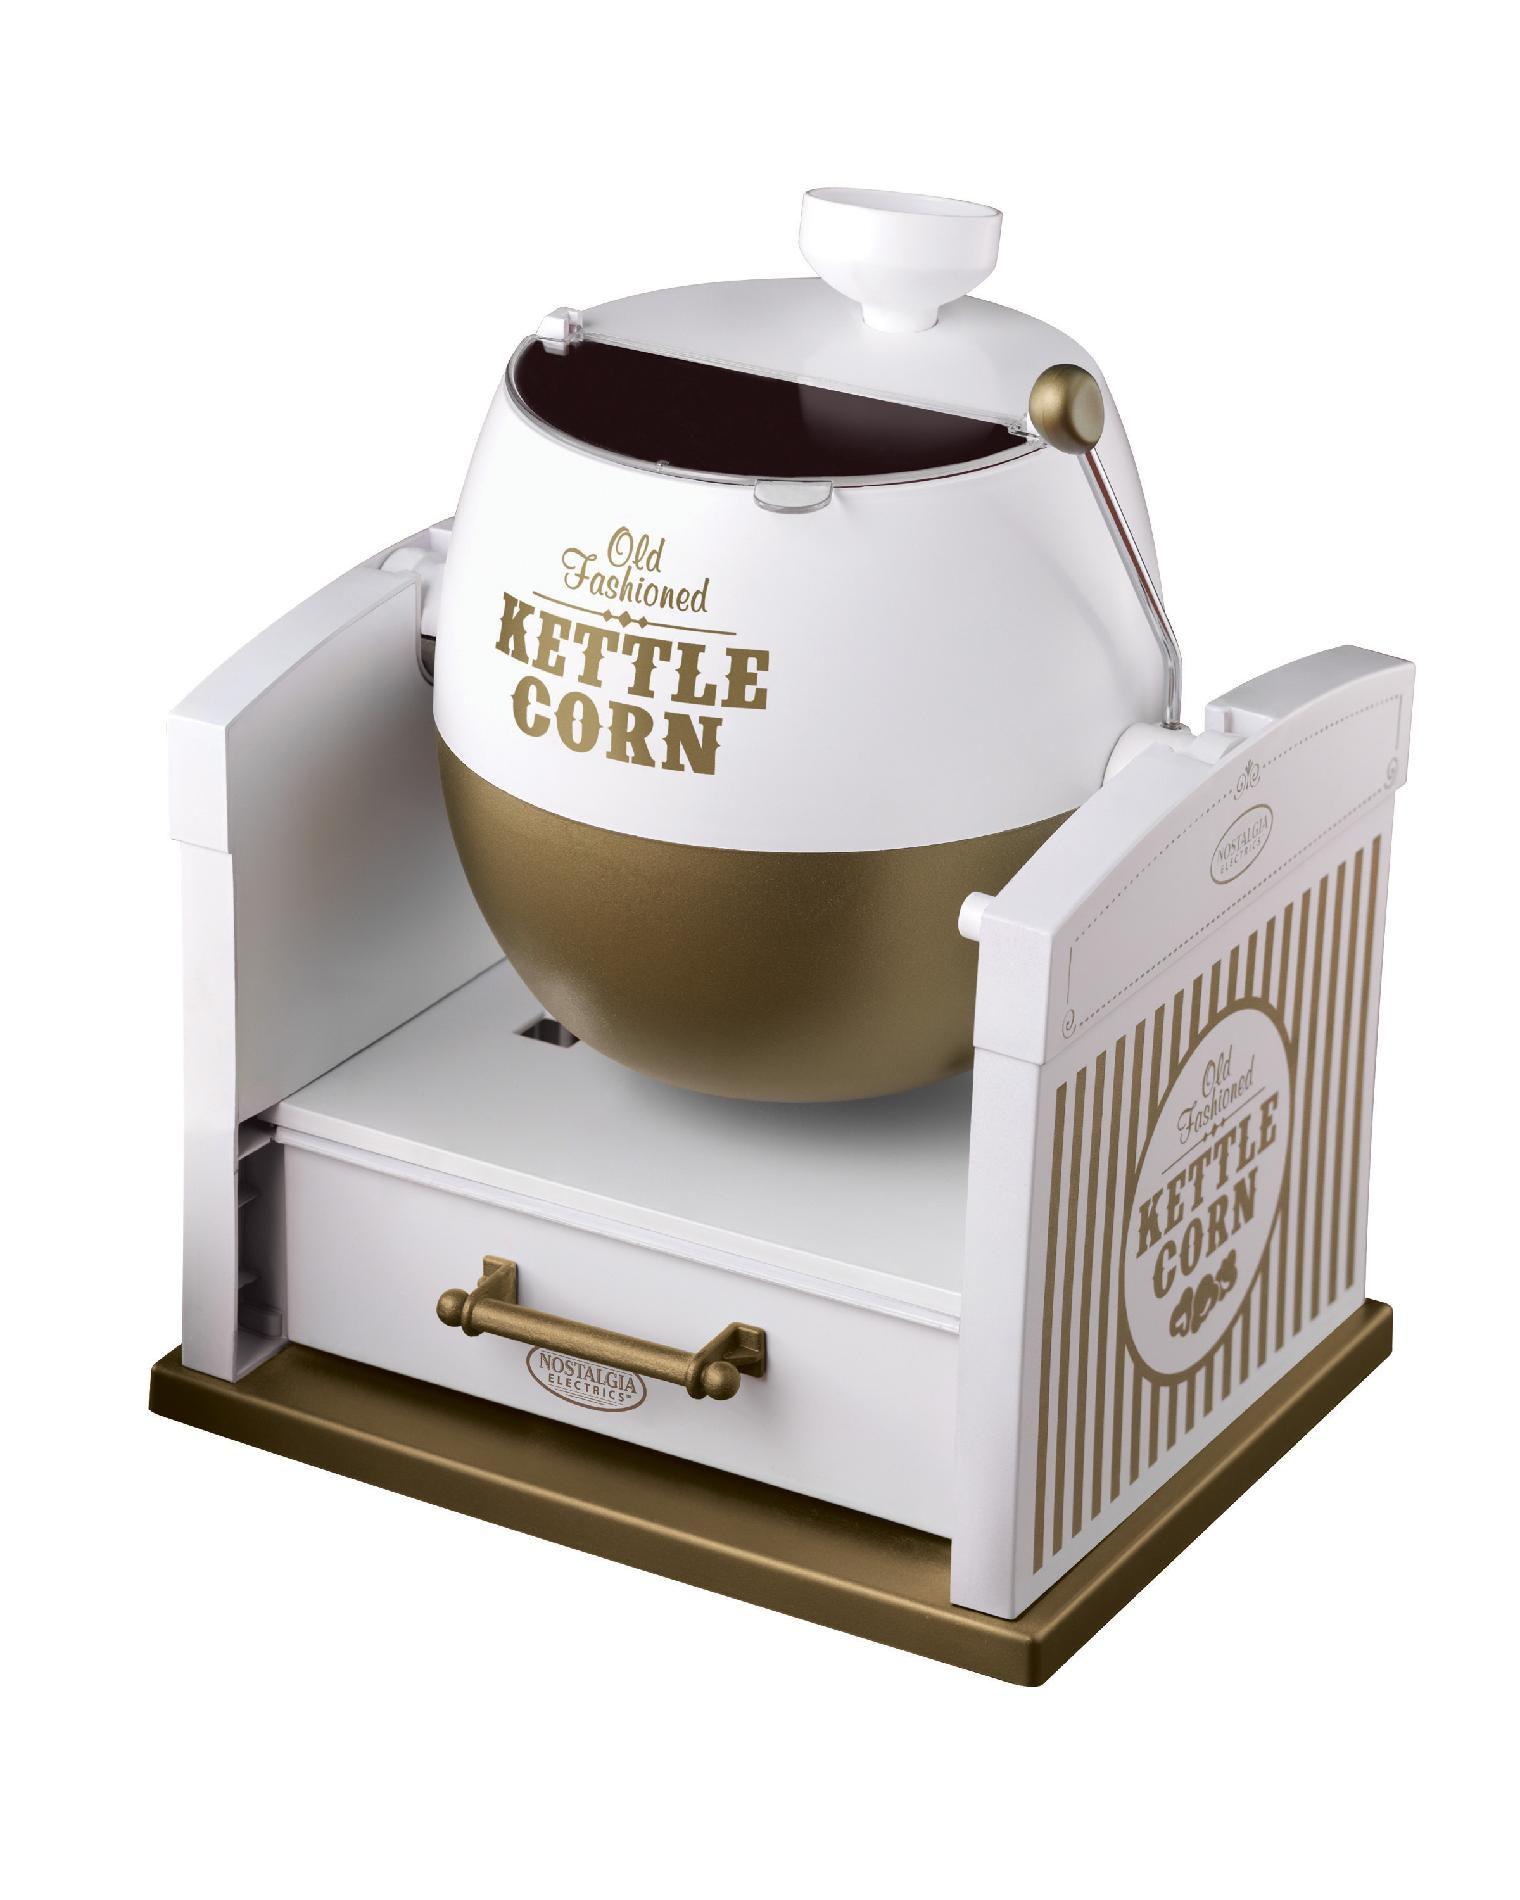 Nostalgia Electrics Kcp100 Kettle Corn Maker